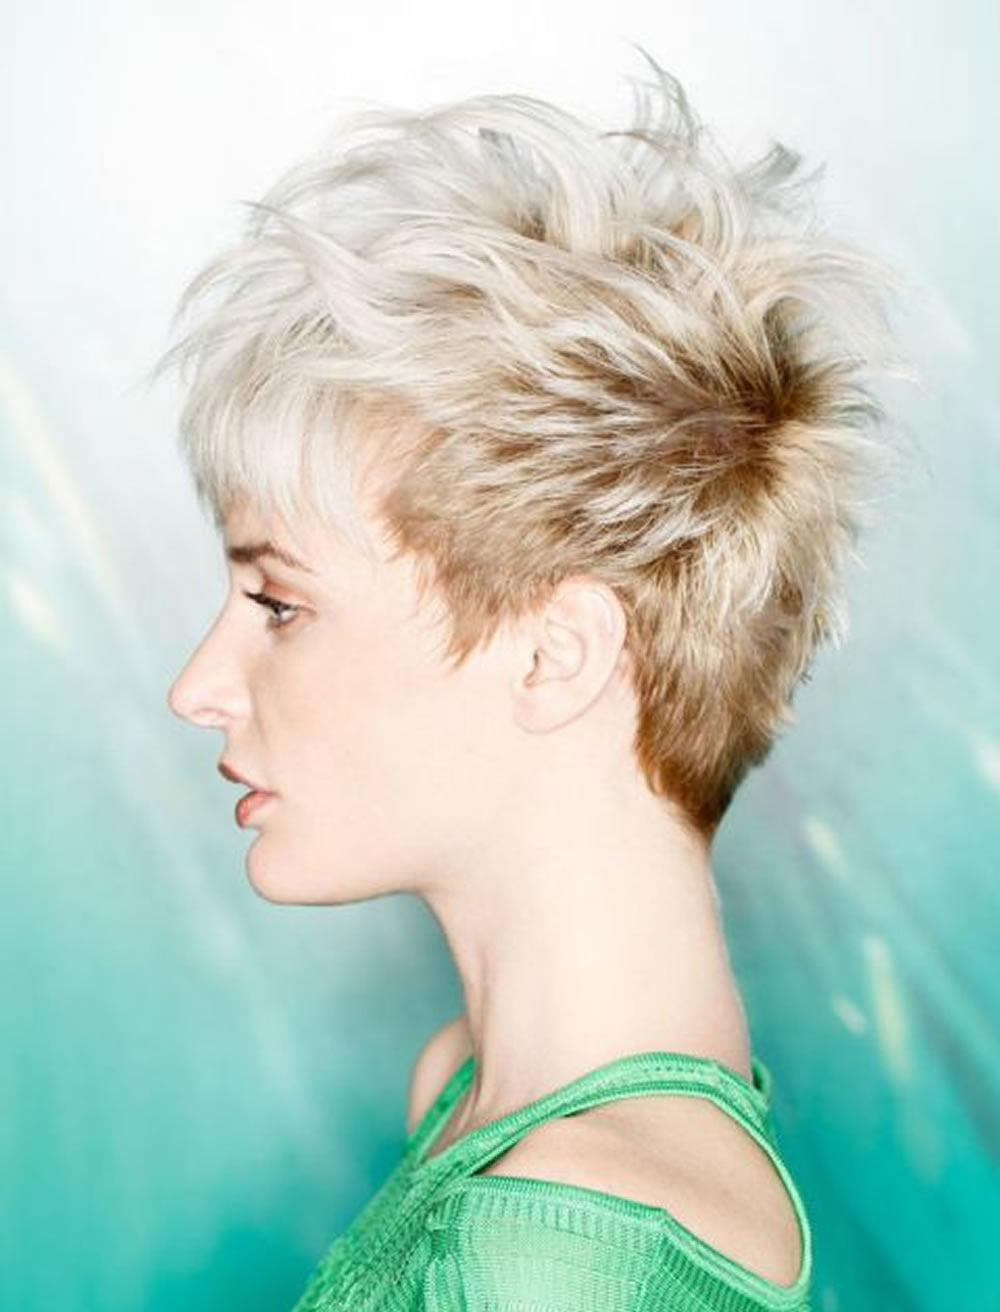 Easy Hairstyles For Short Hair 2018 2019 Amp Pixie Hair Cuts